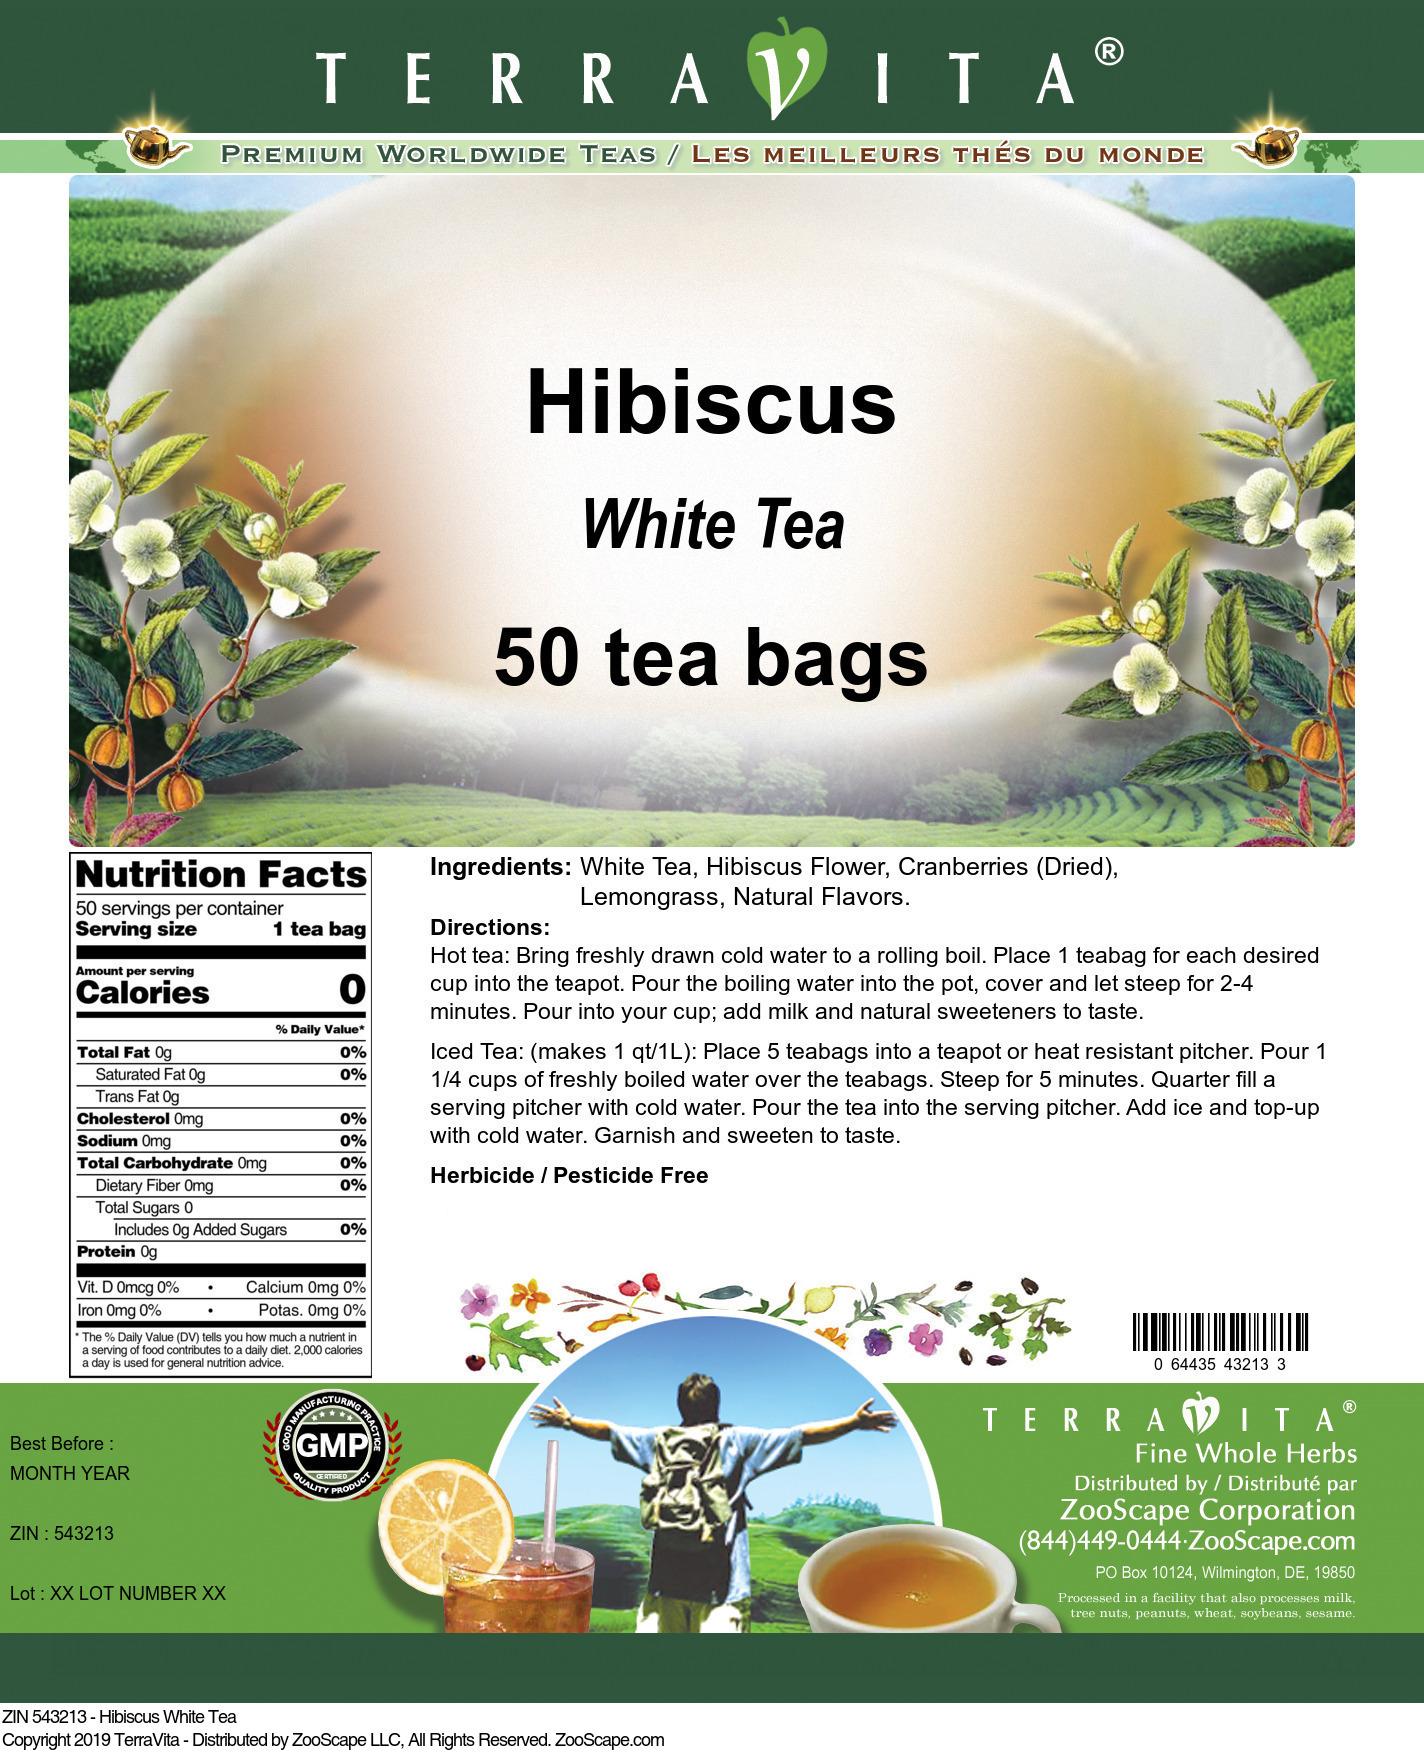 Hibiscus White Tea